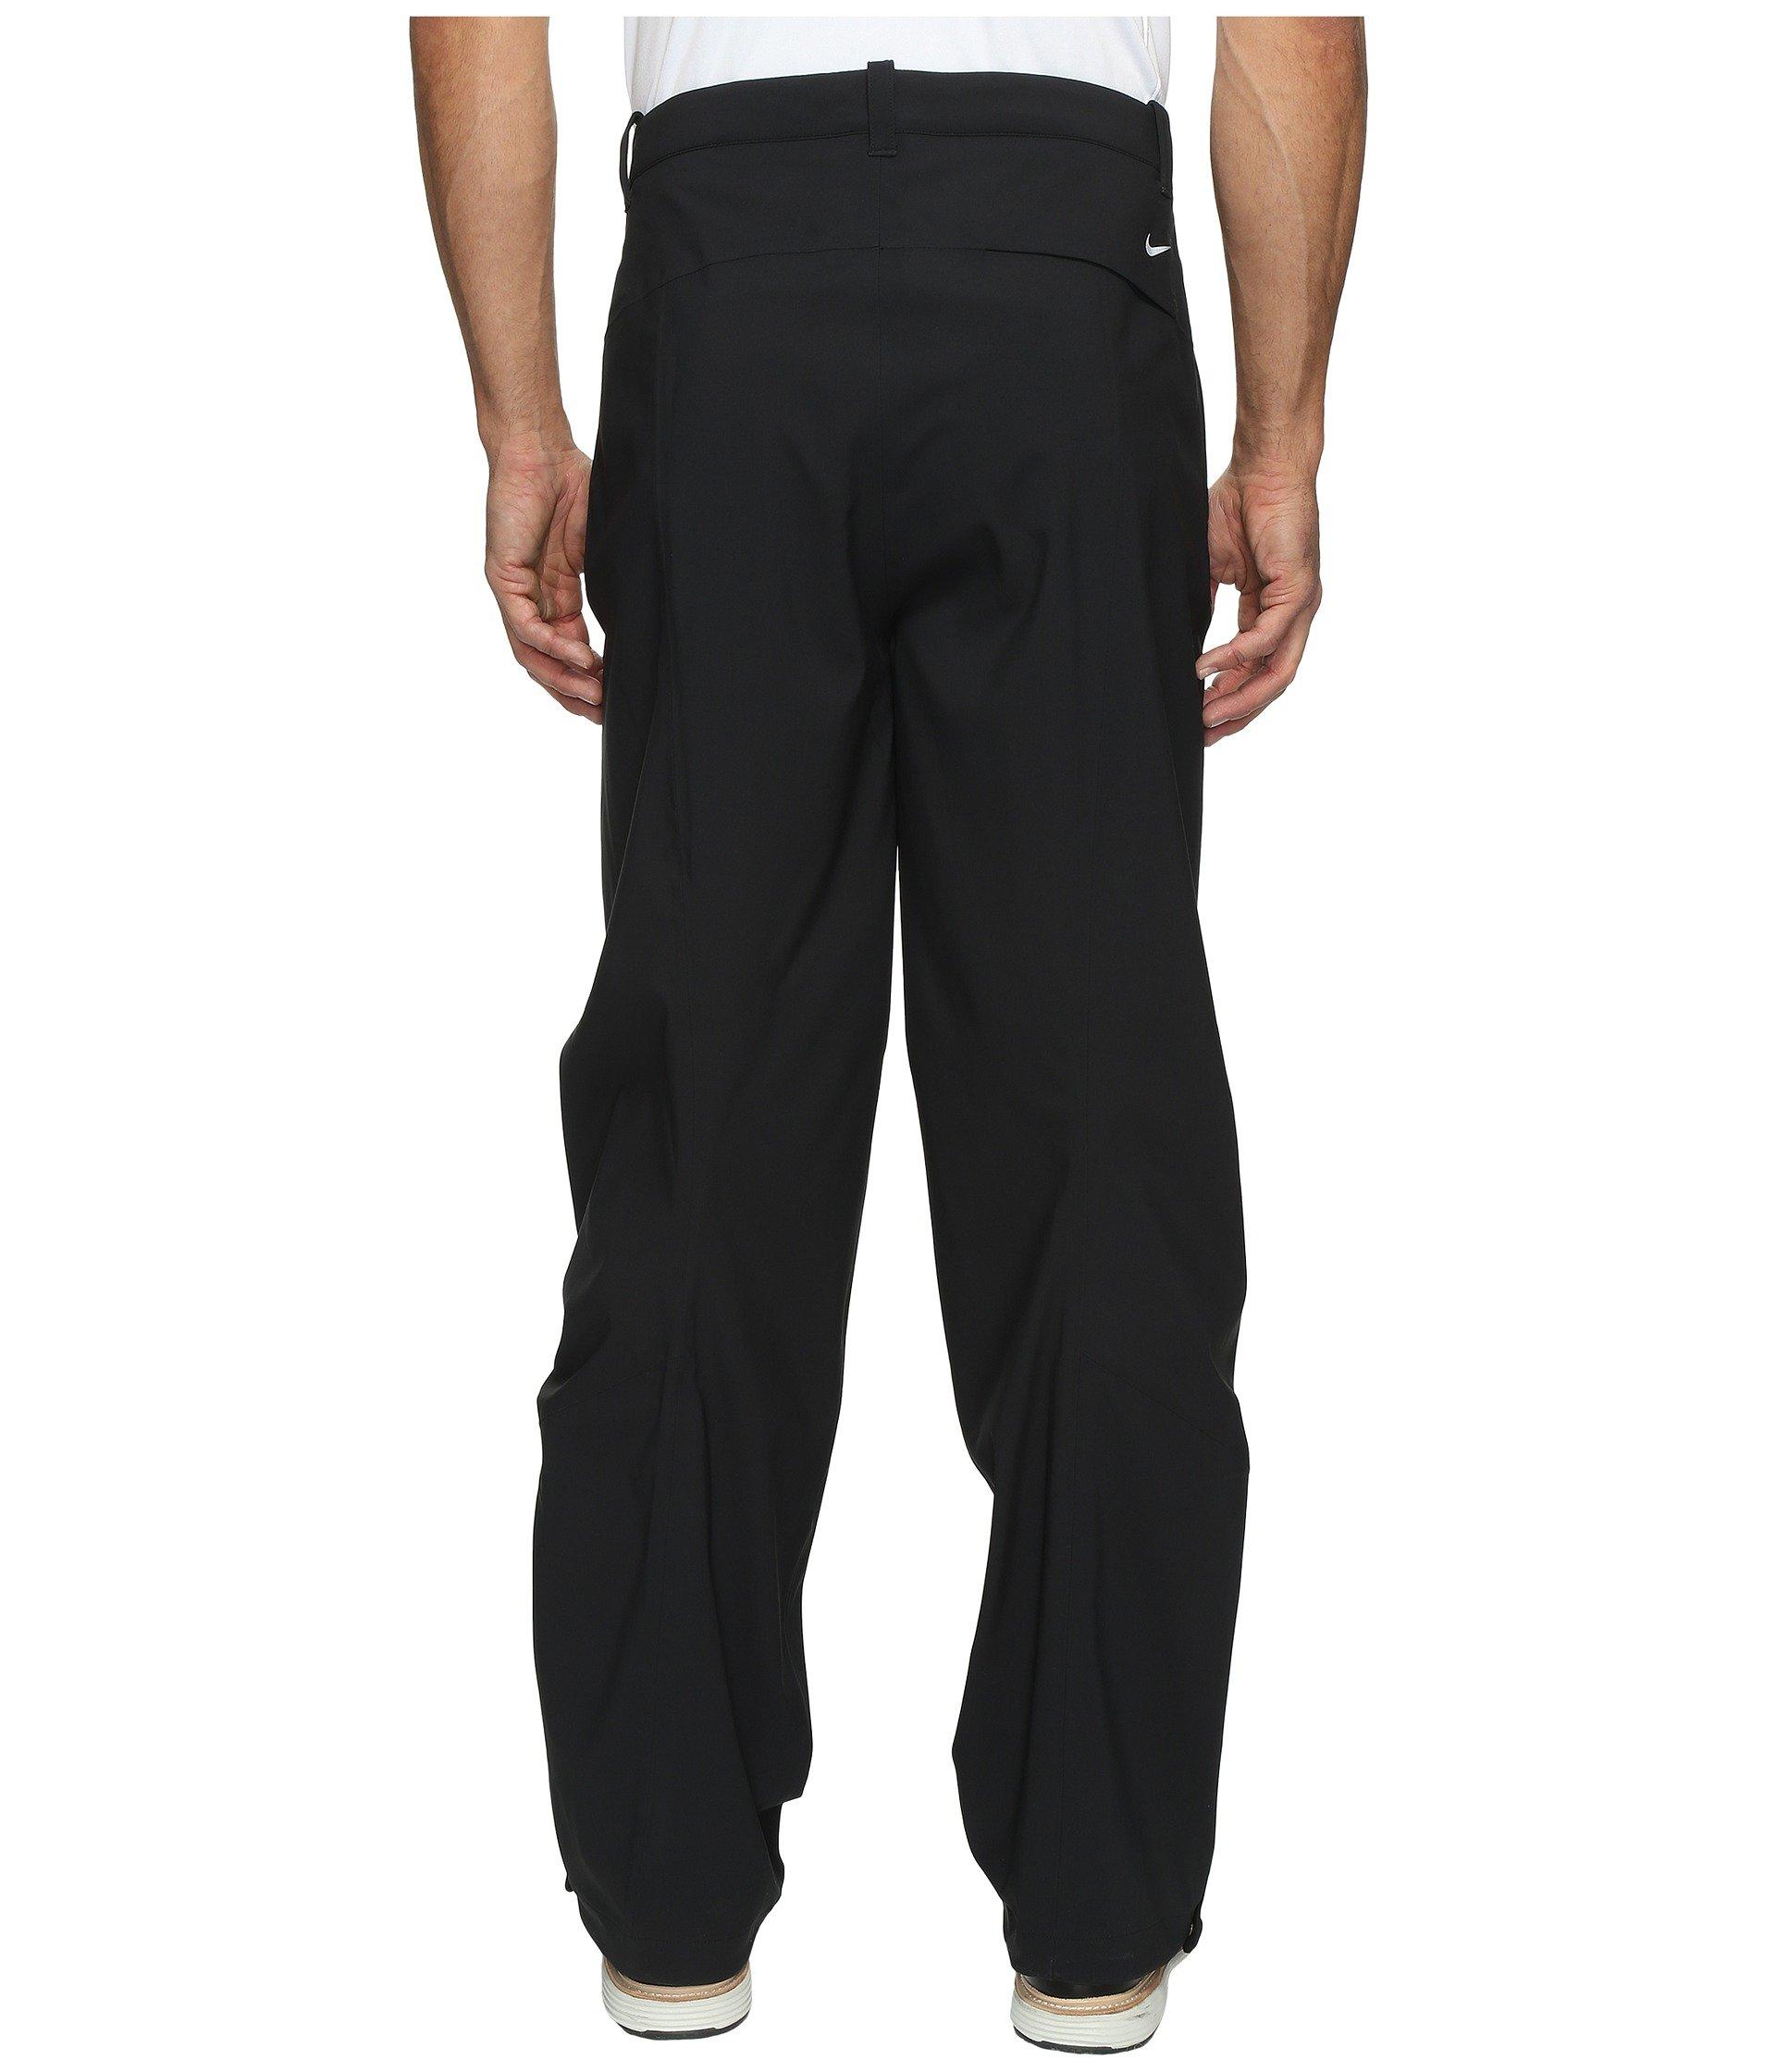 Nike Men's Hyper Storm-FIT Golf Pants by Nike Golf (Image #3)